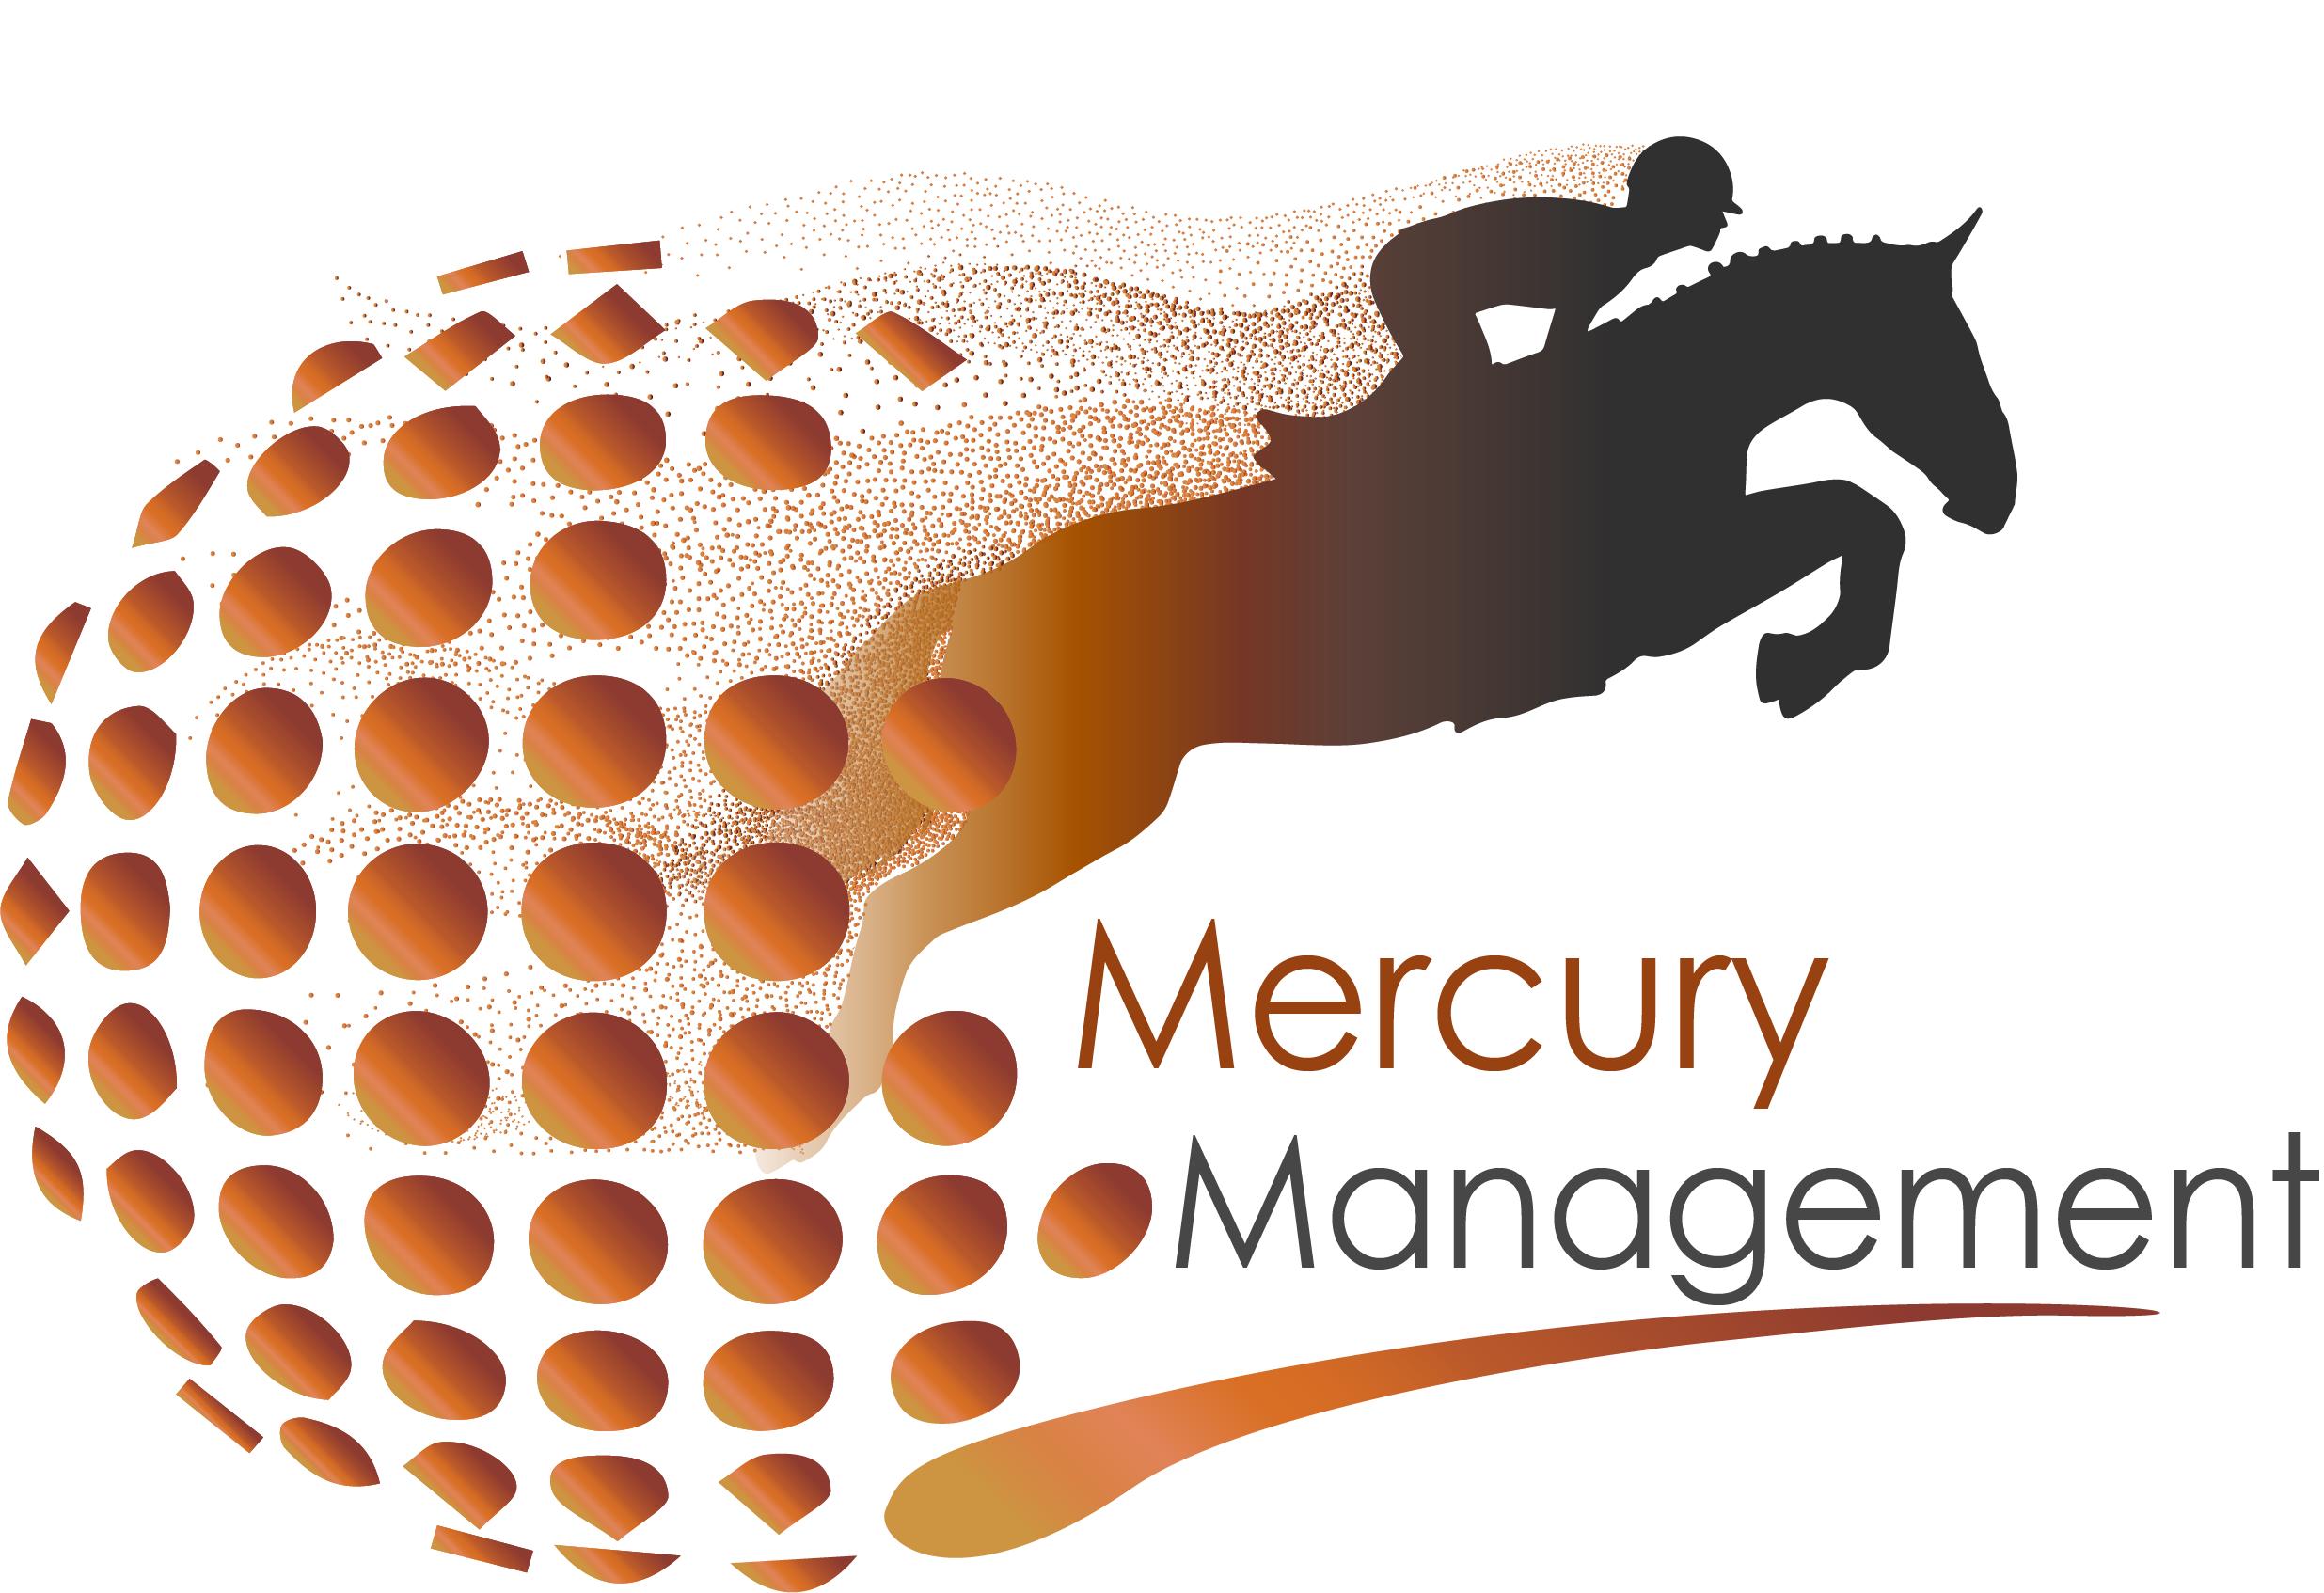 MercuryManagement_orange_steel_fadeFINAL.png